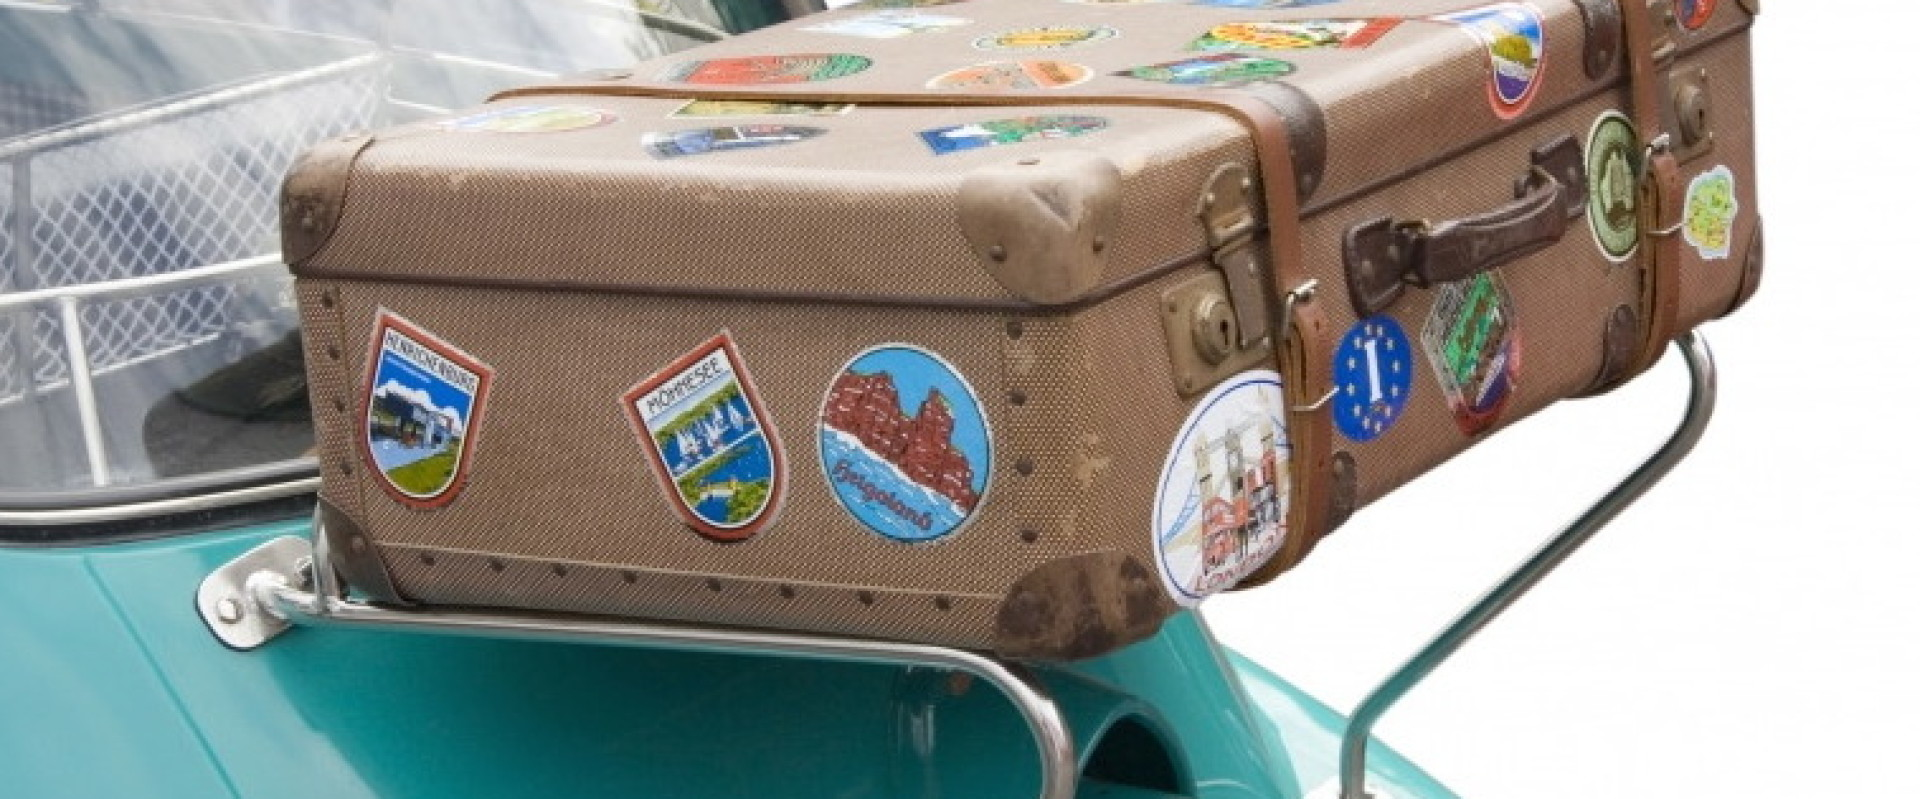 Vakantie checklist: zonder stress op reis